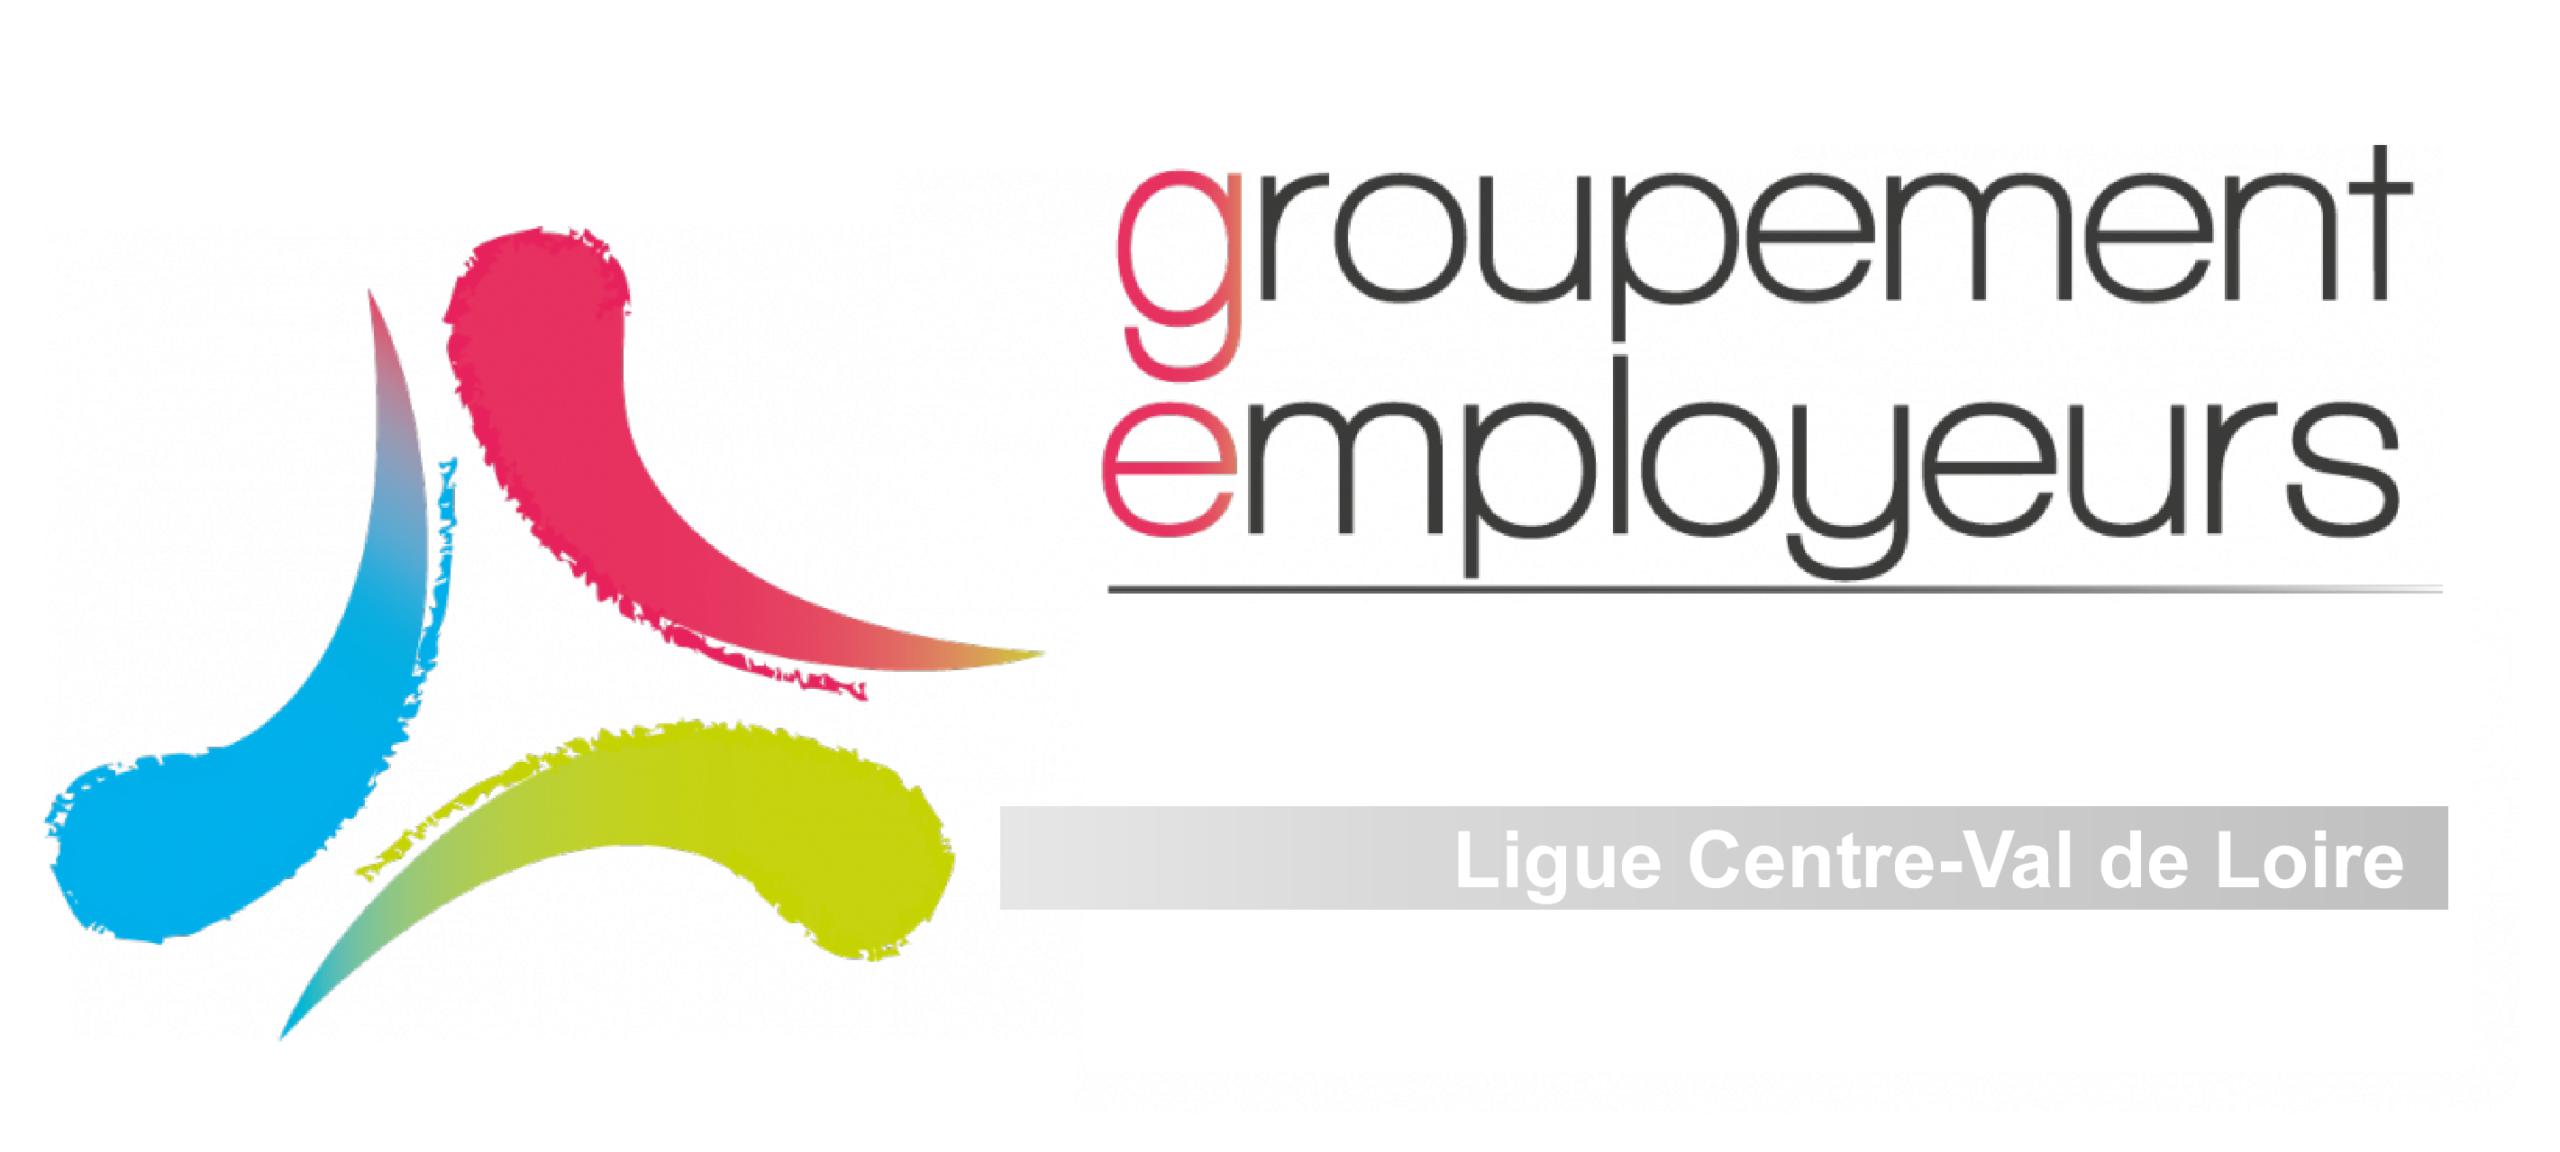 groupement-employeurs